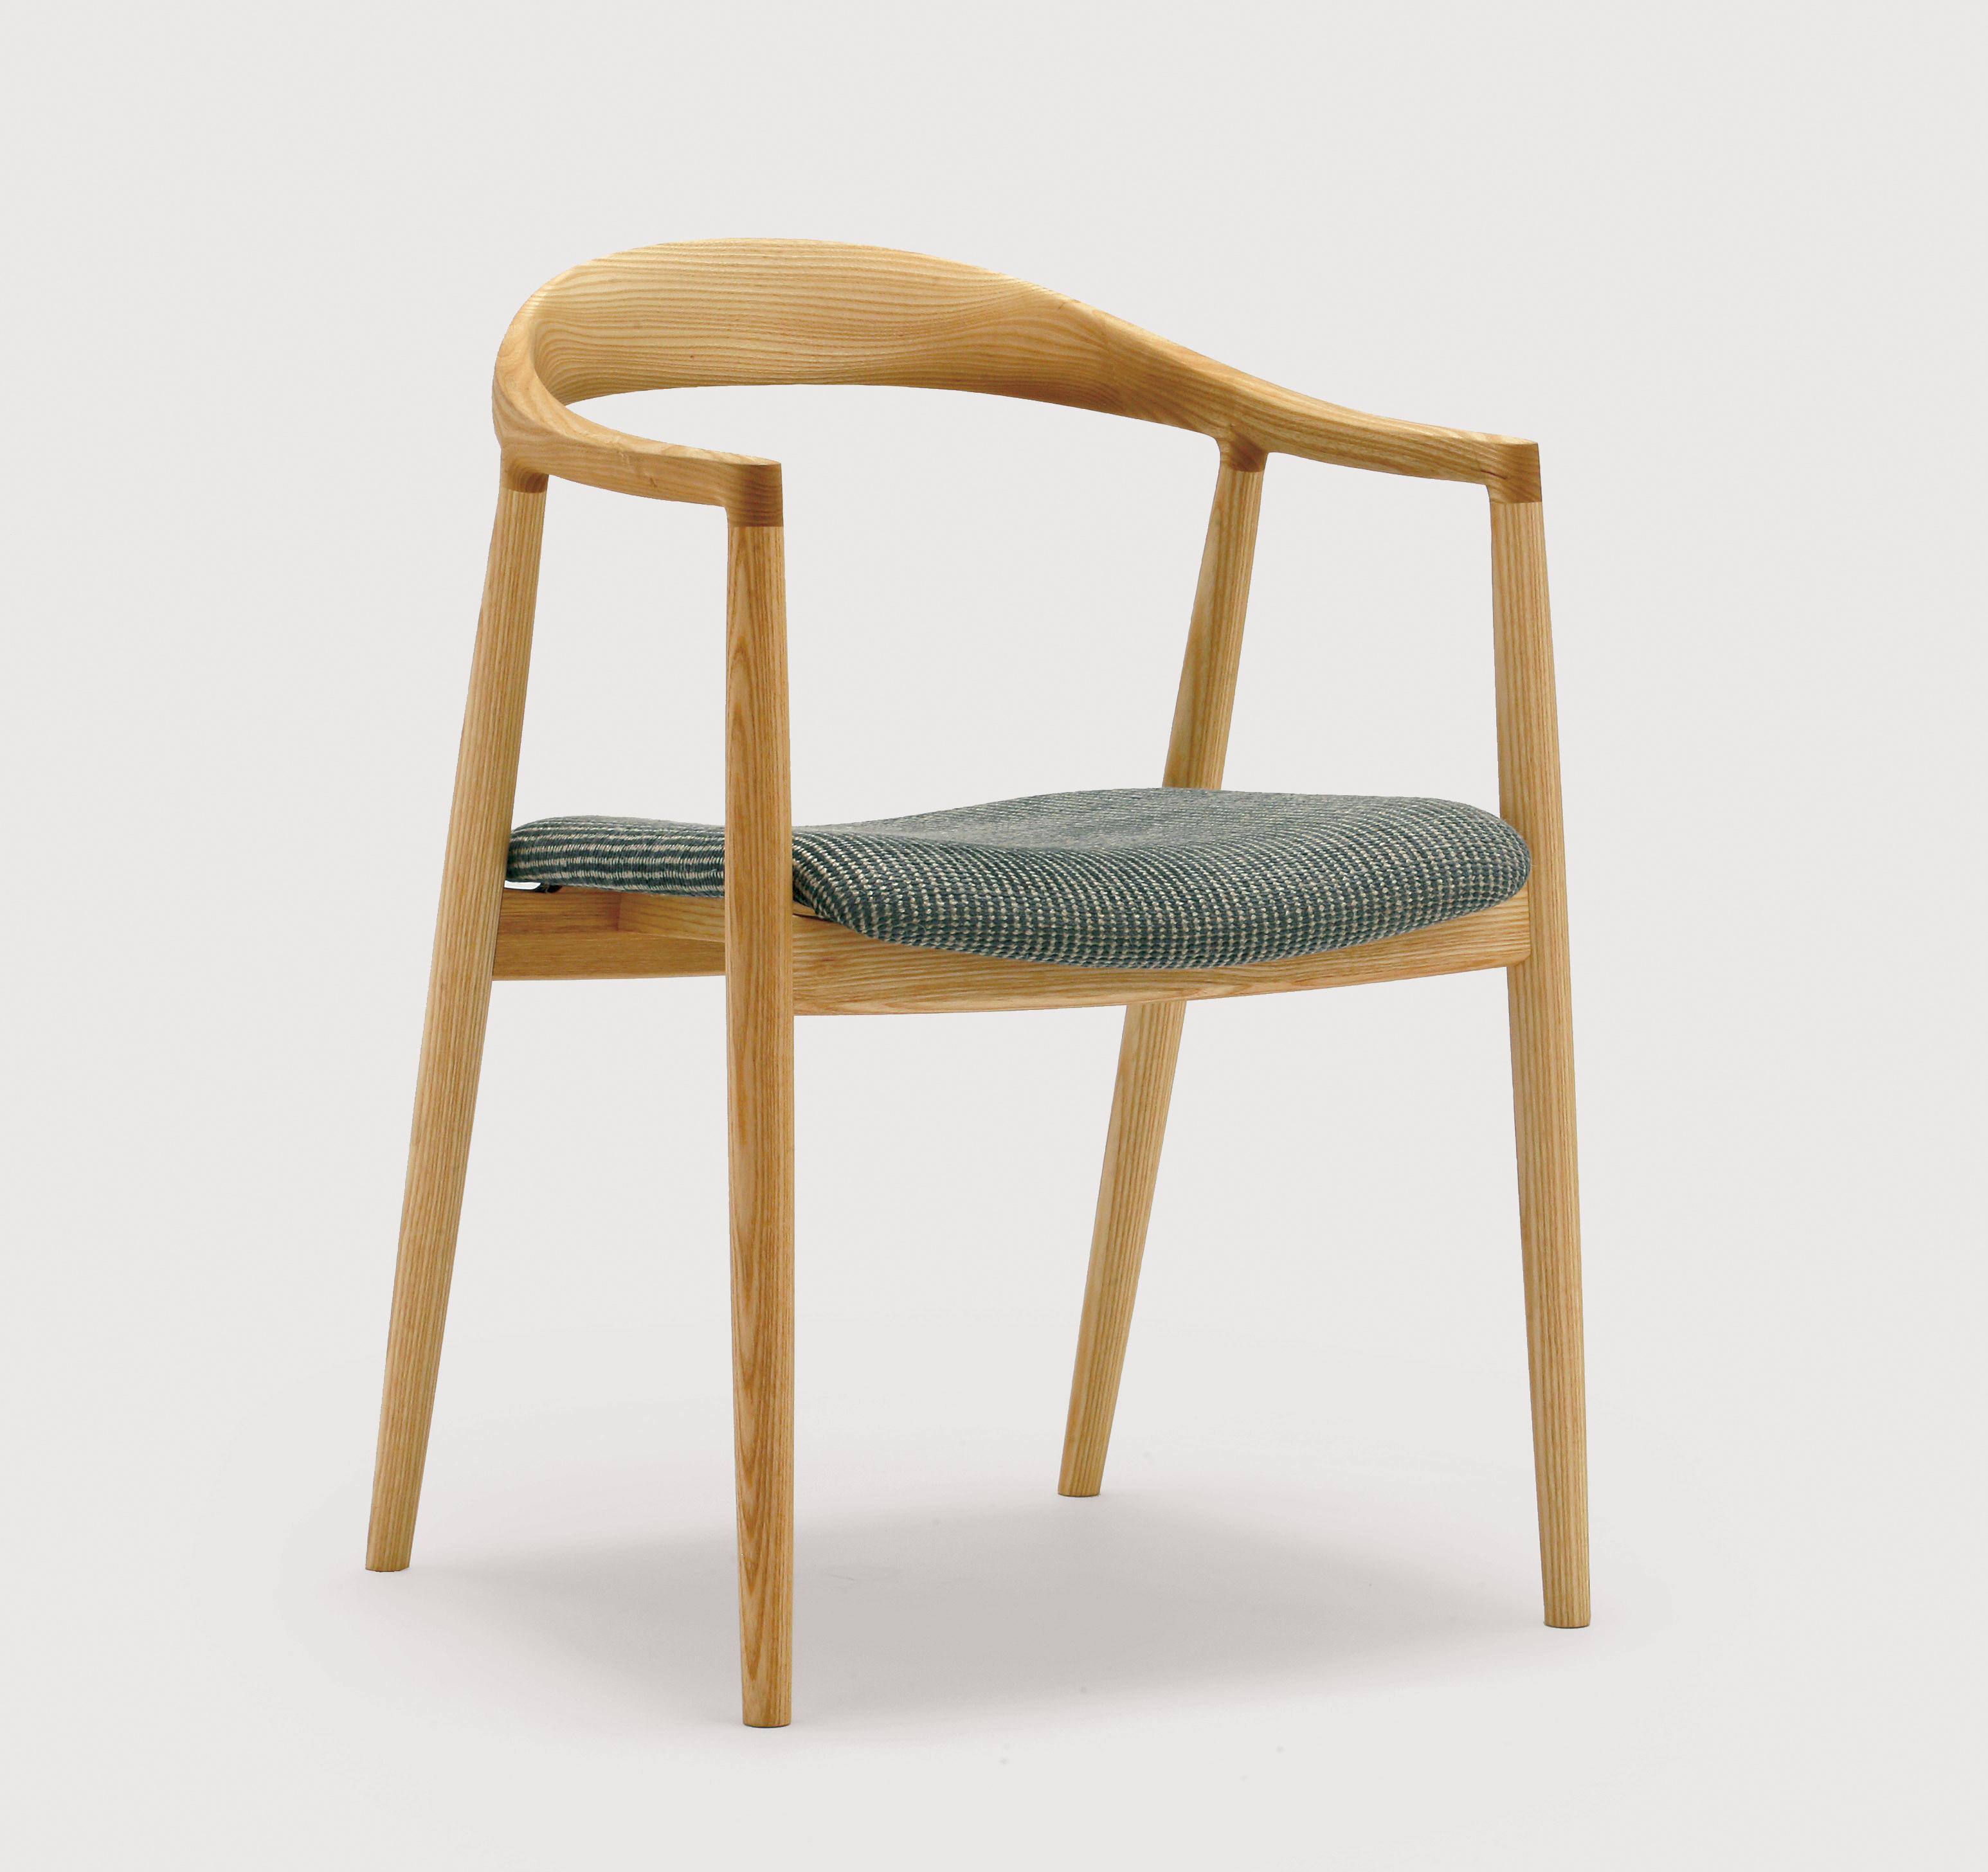 Igloo Homeware Wooden Furniture Boutique Hong Kong